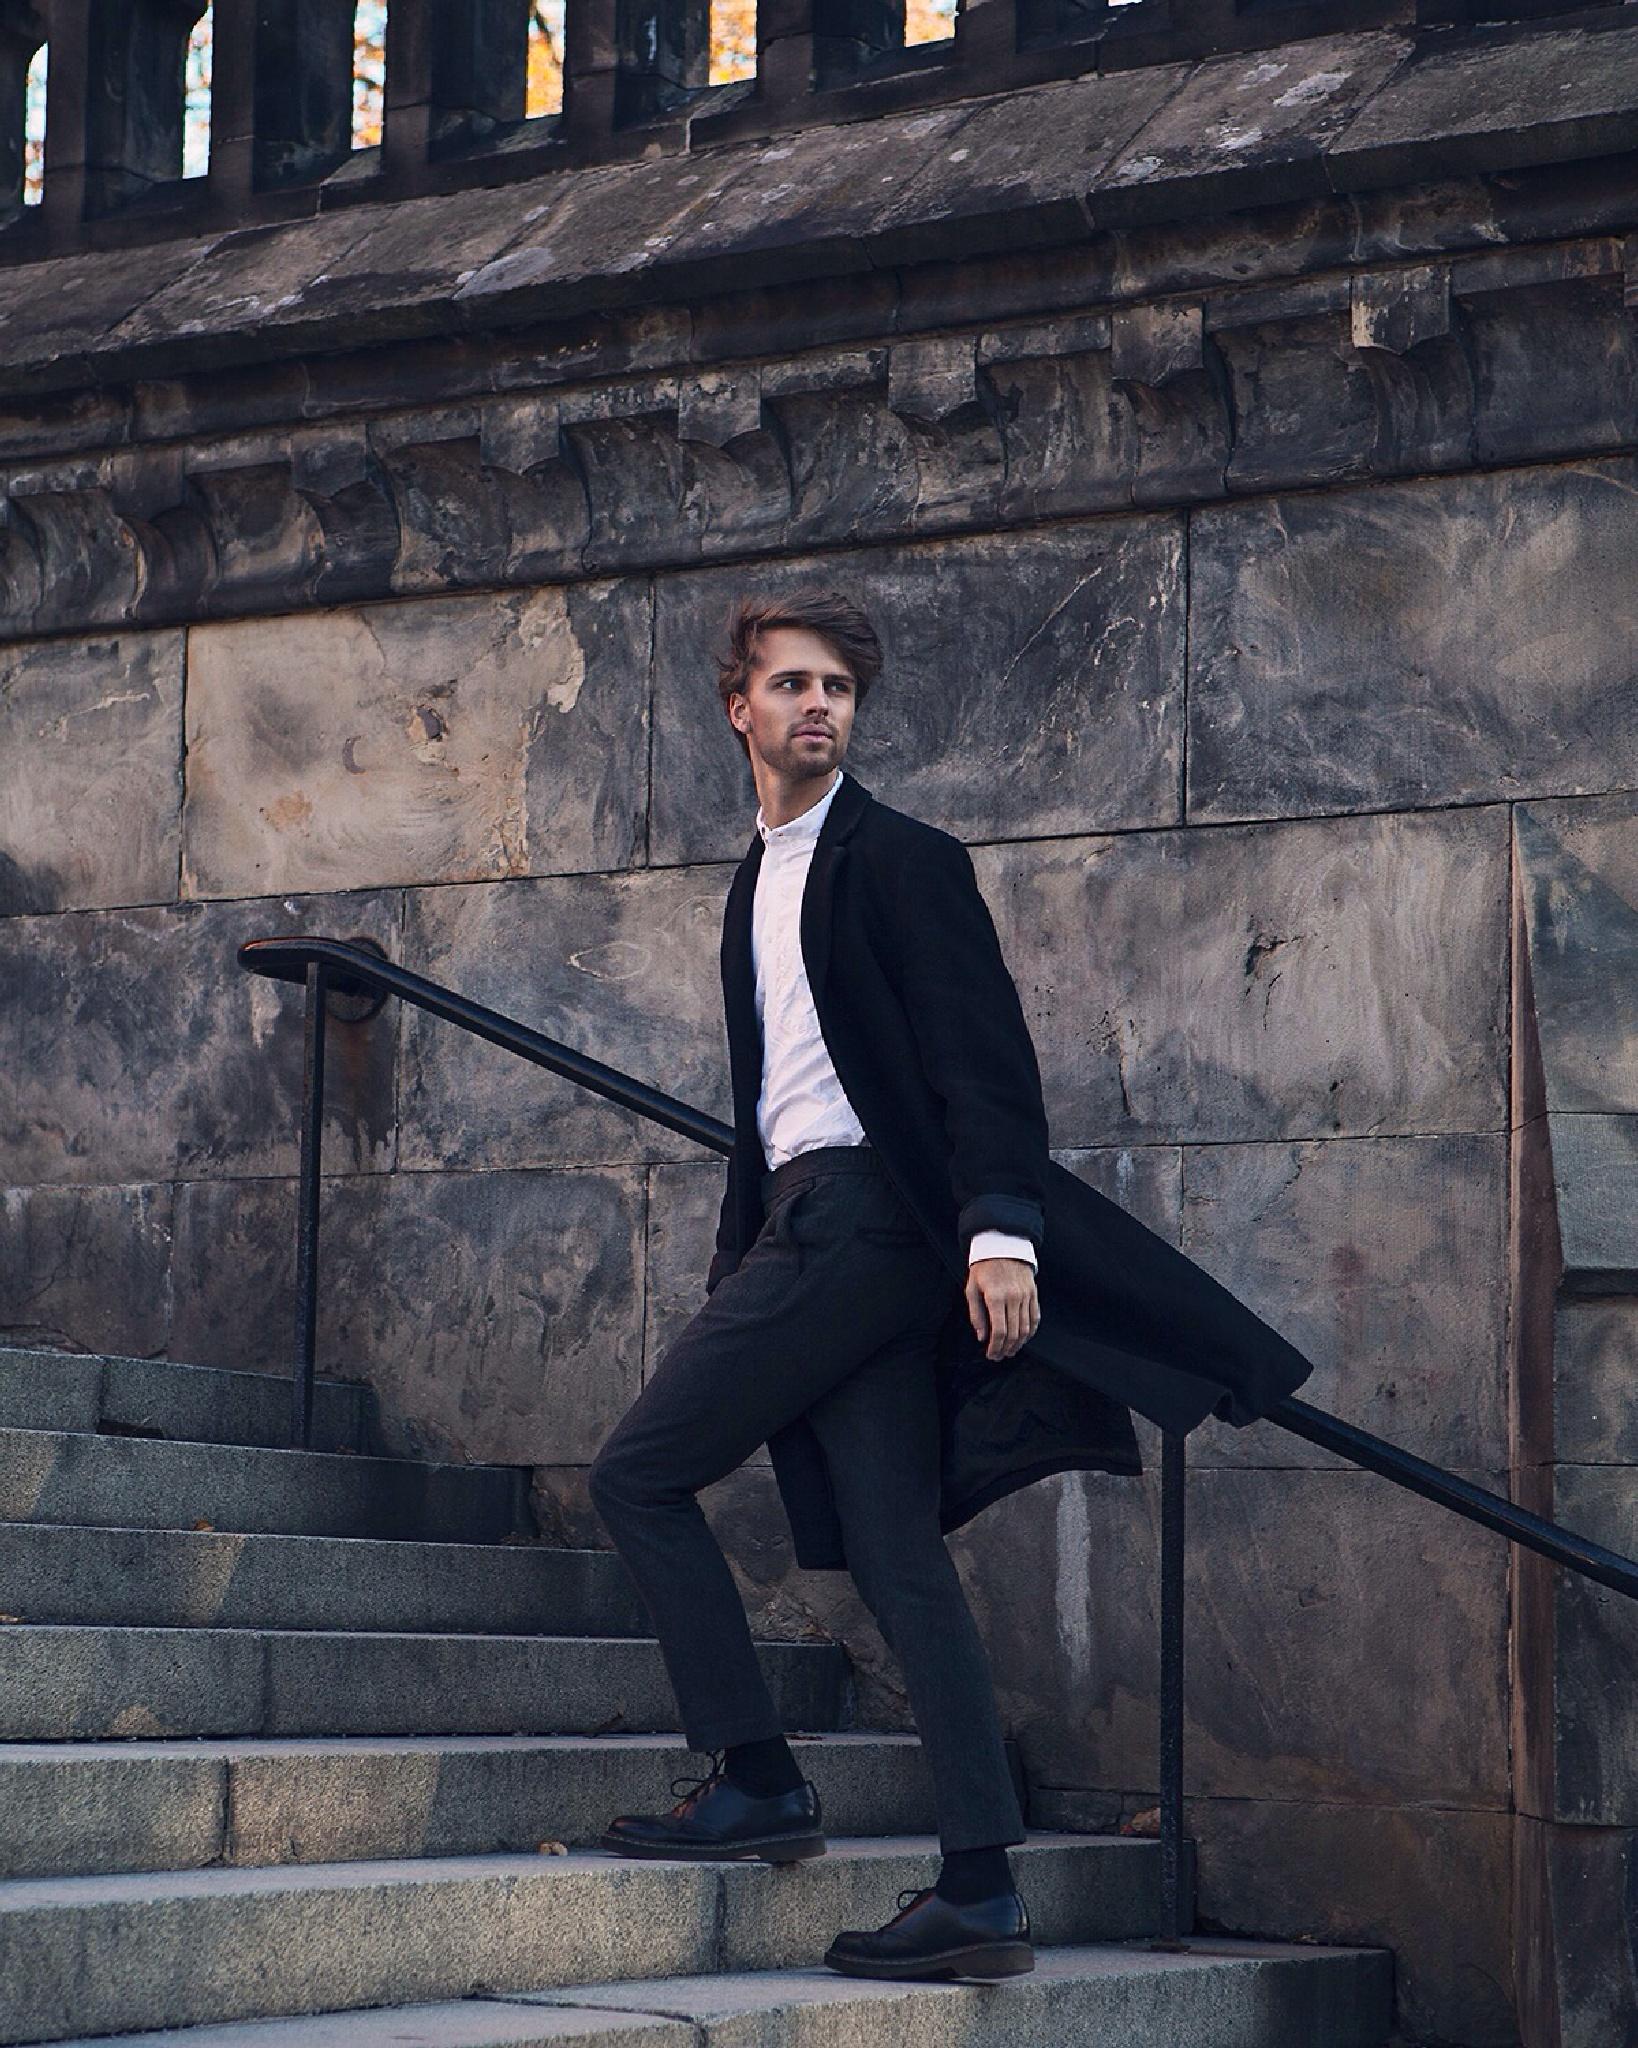 Urban Gentleman by MarkusOskarssonPhotography